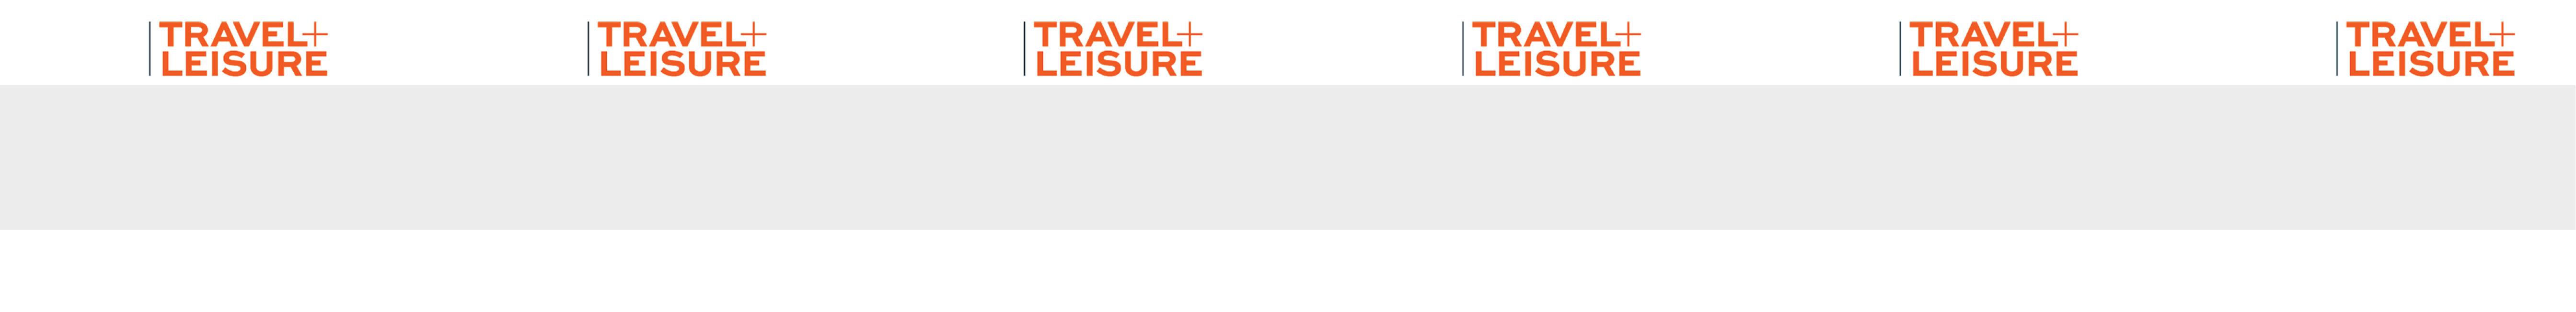 Travel + Leisure A-List Logos